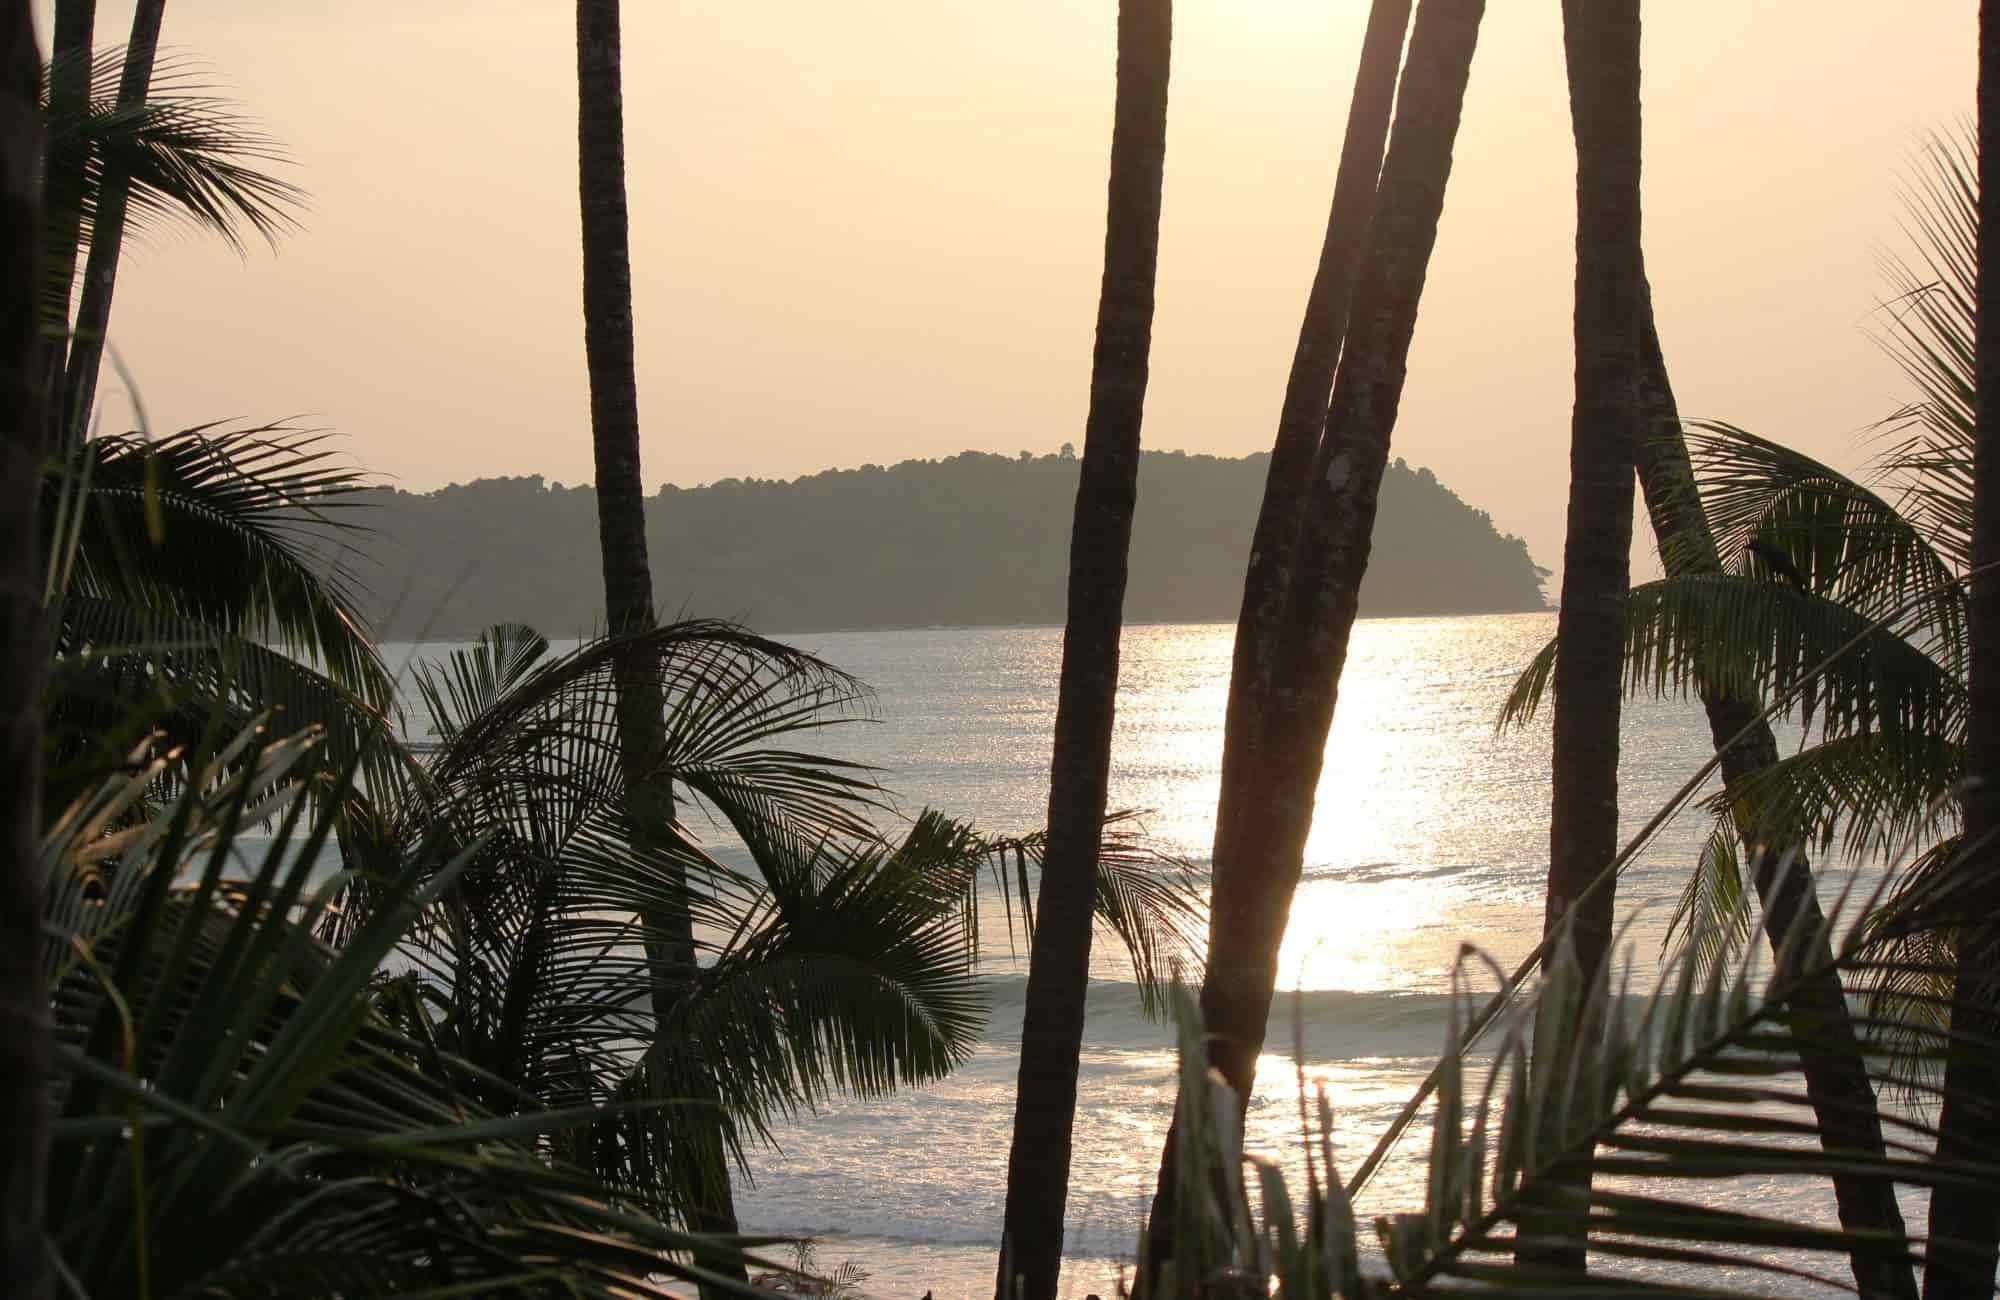 Voyage Birmanie - Ngapali - Amplitudes